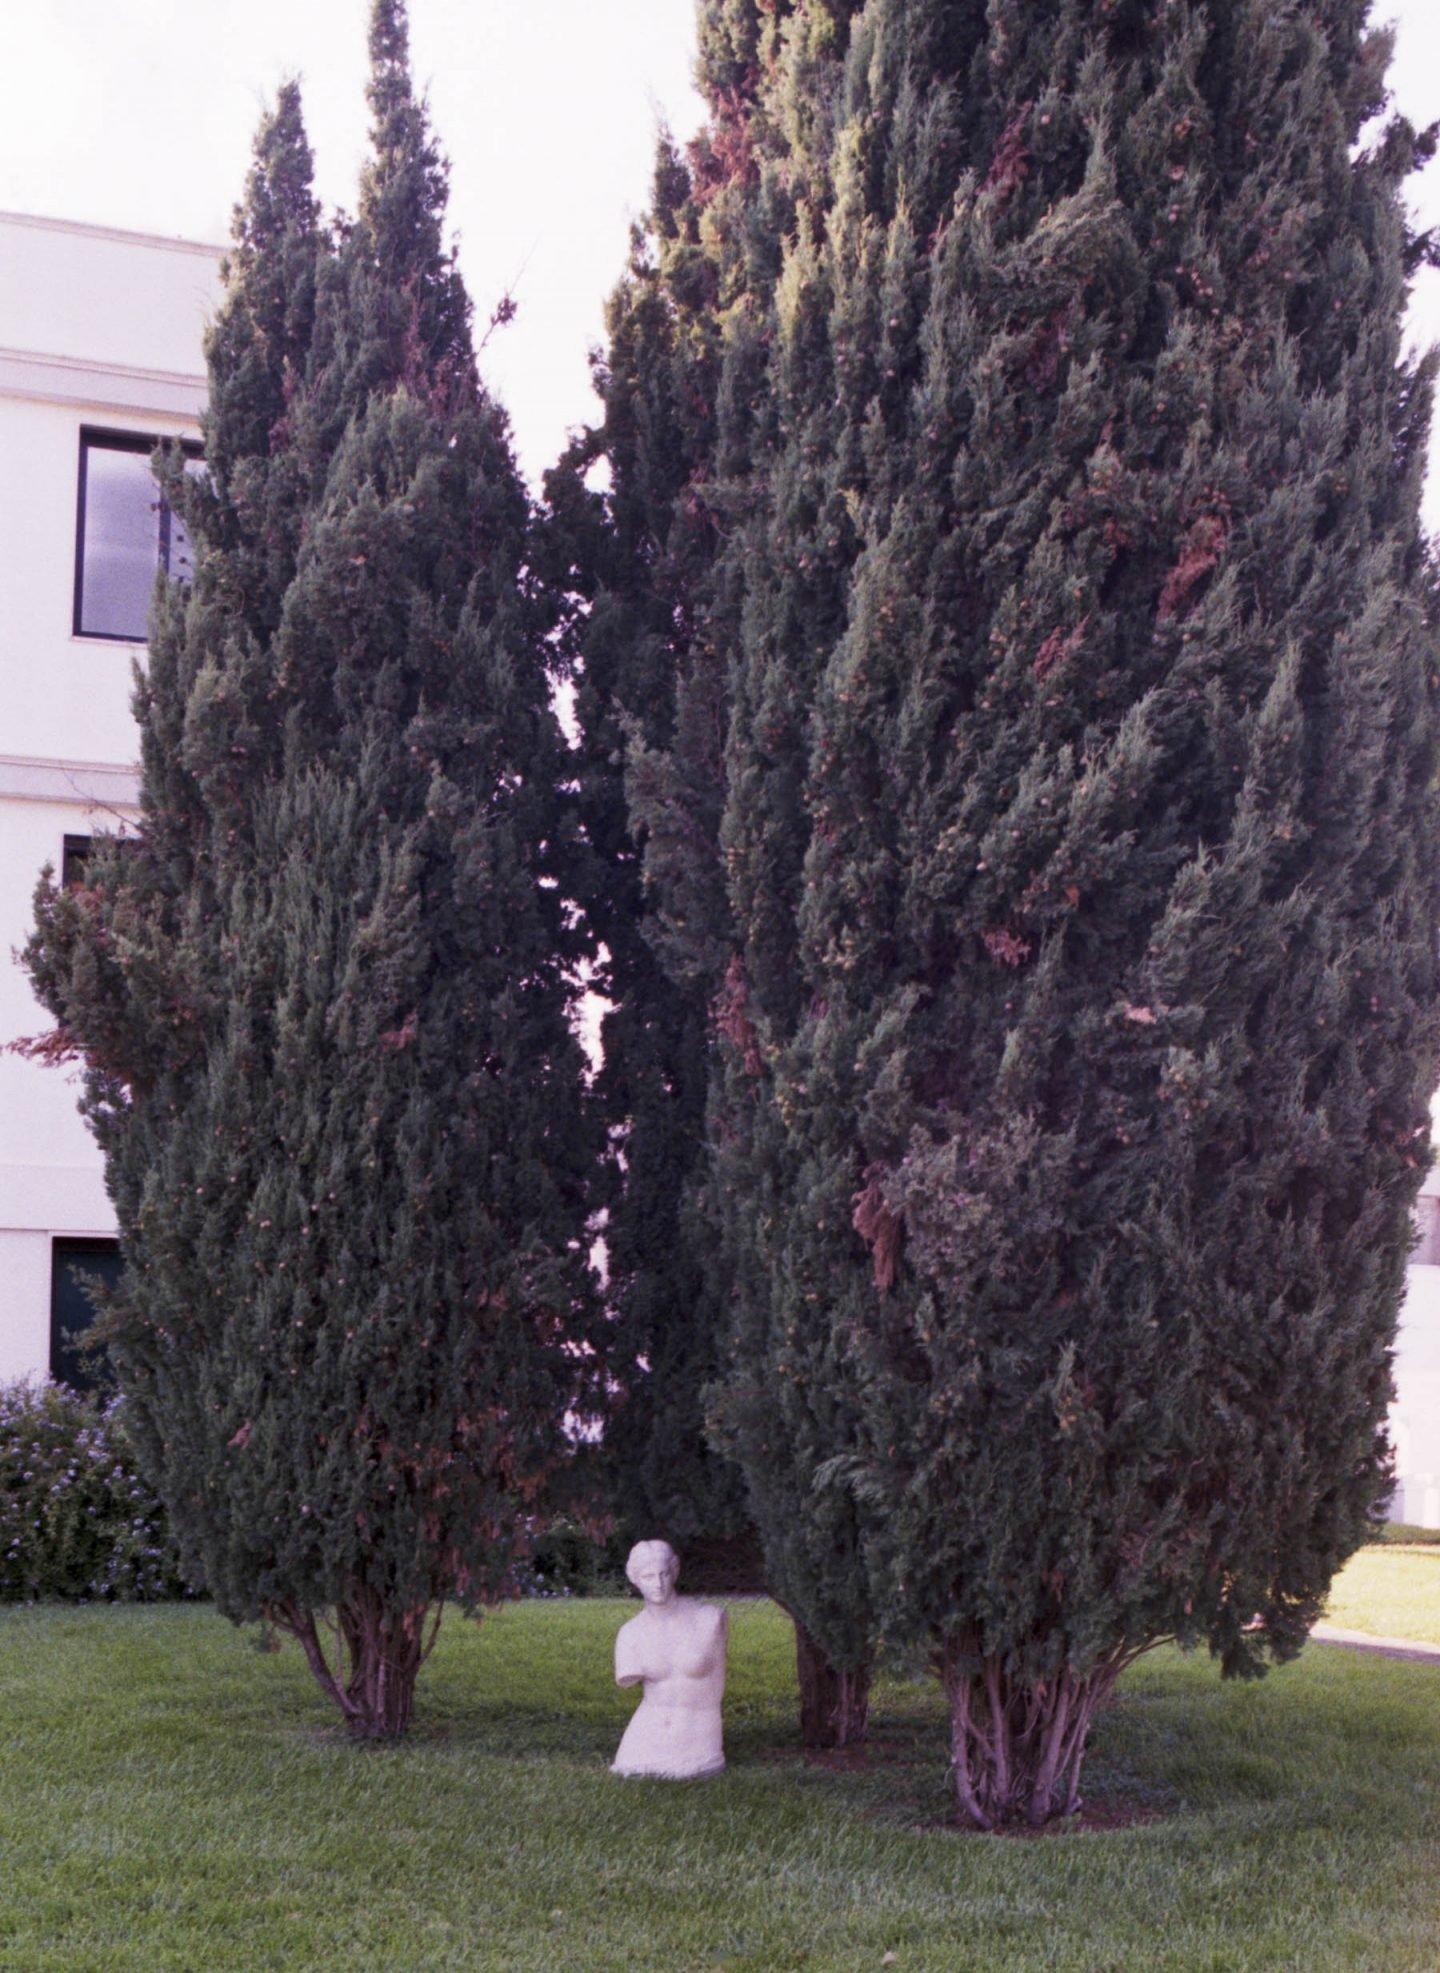 iGNANT-Stefan-Giftthaler-Statues-08 2